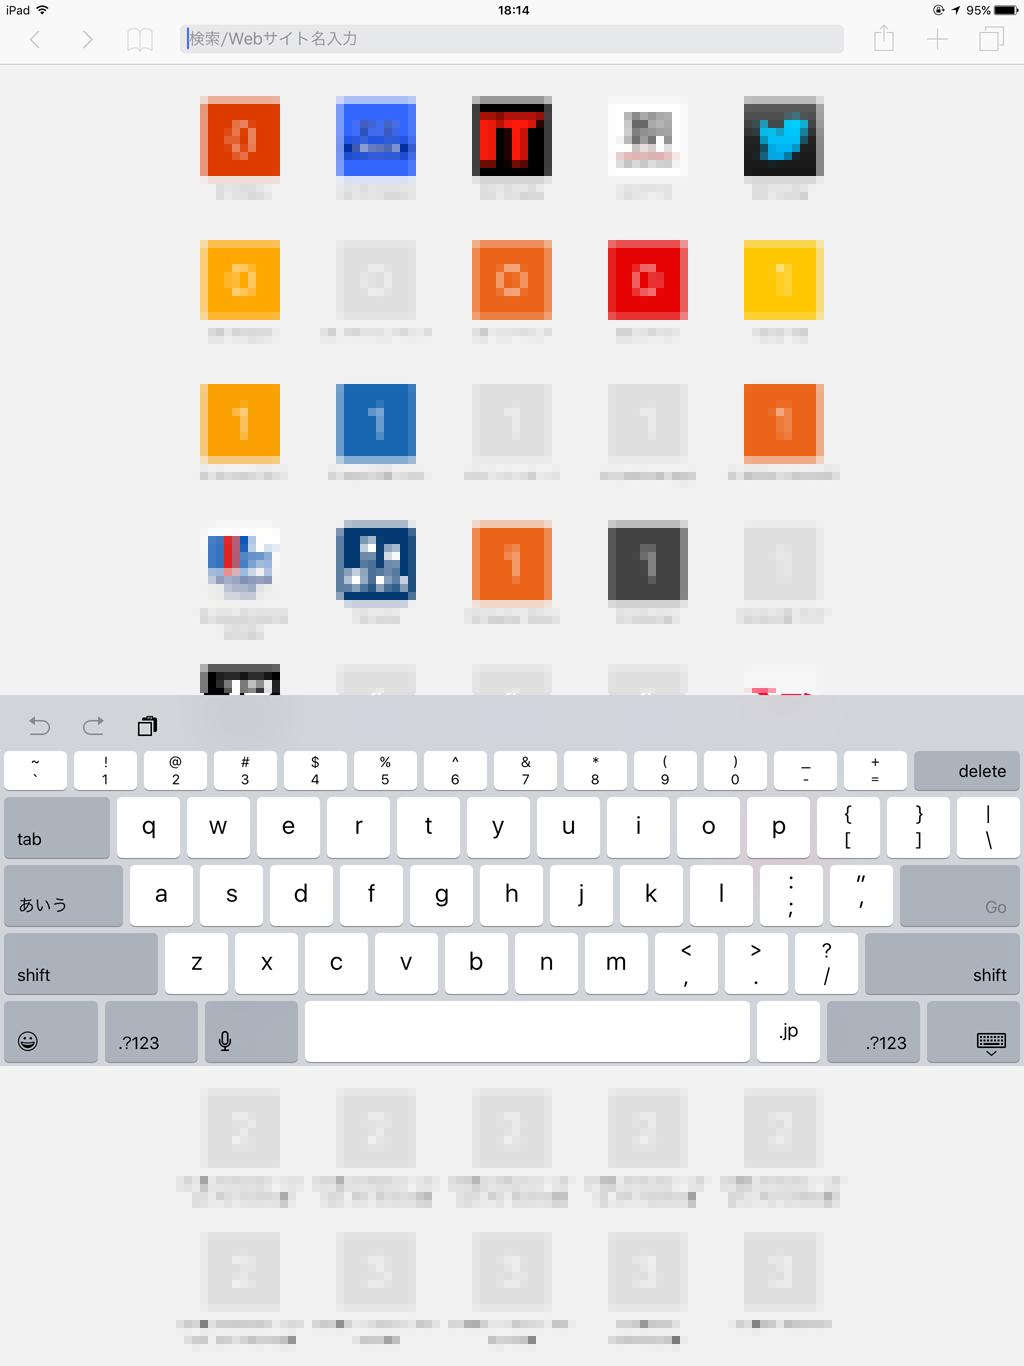 iPad-Pro-keyboard-03a.png